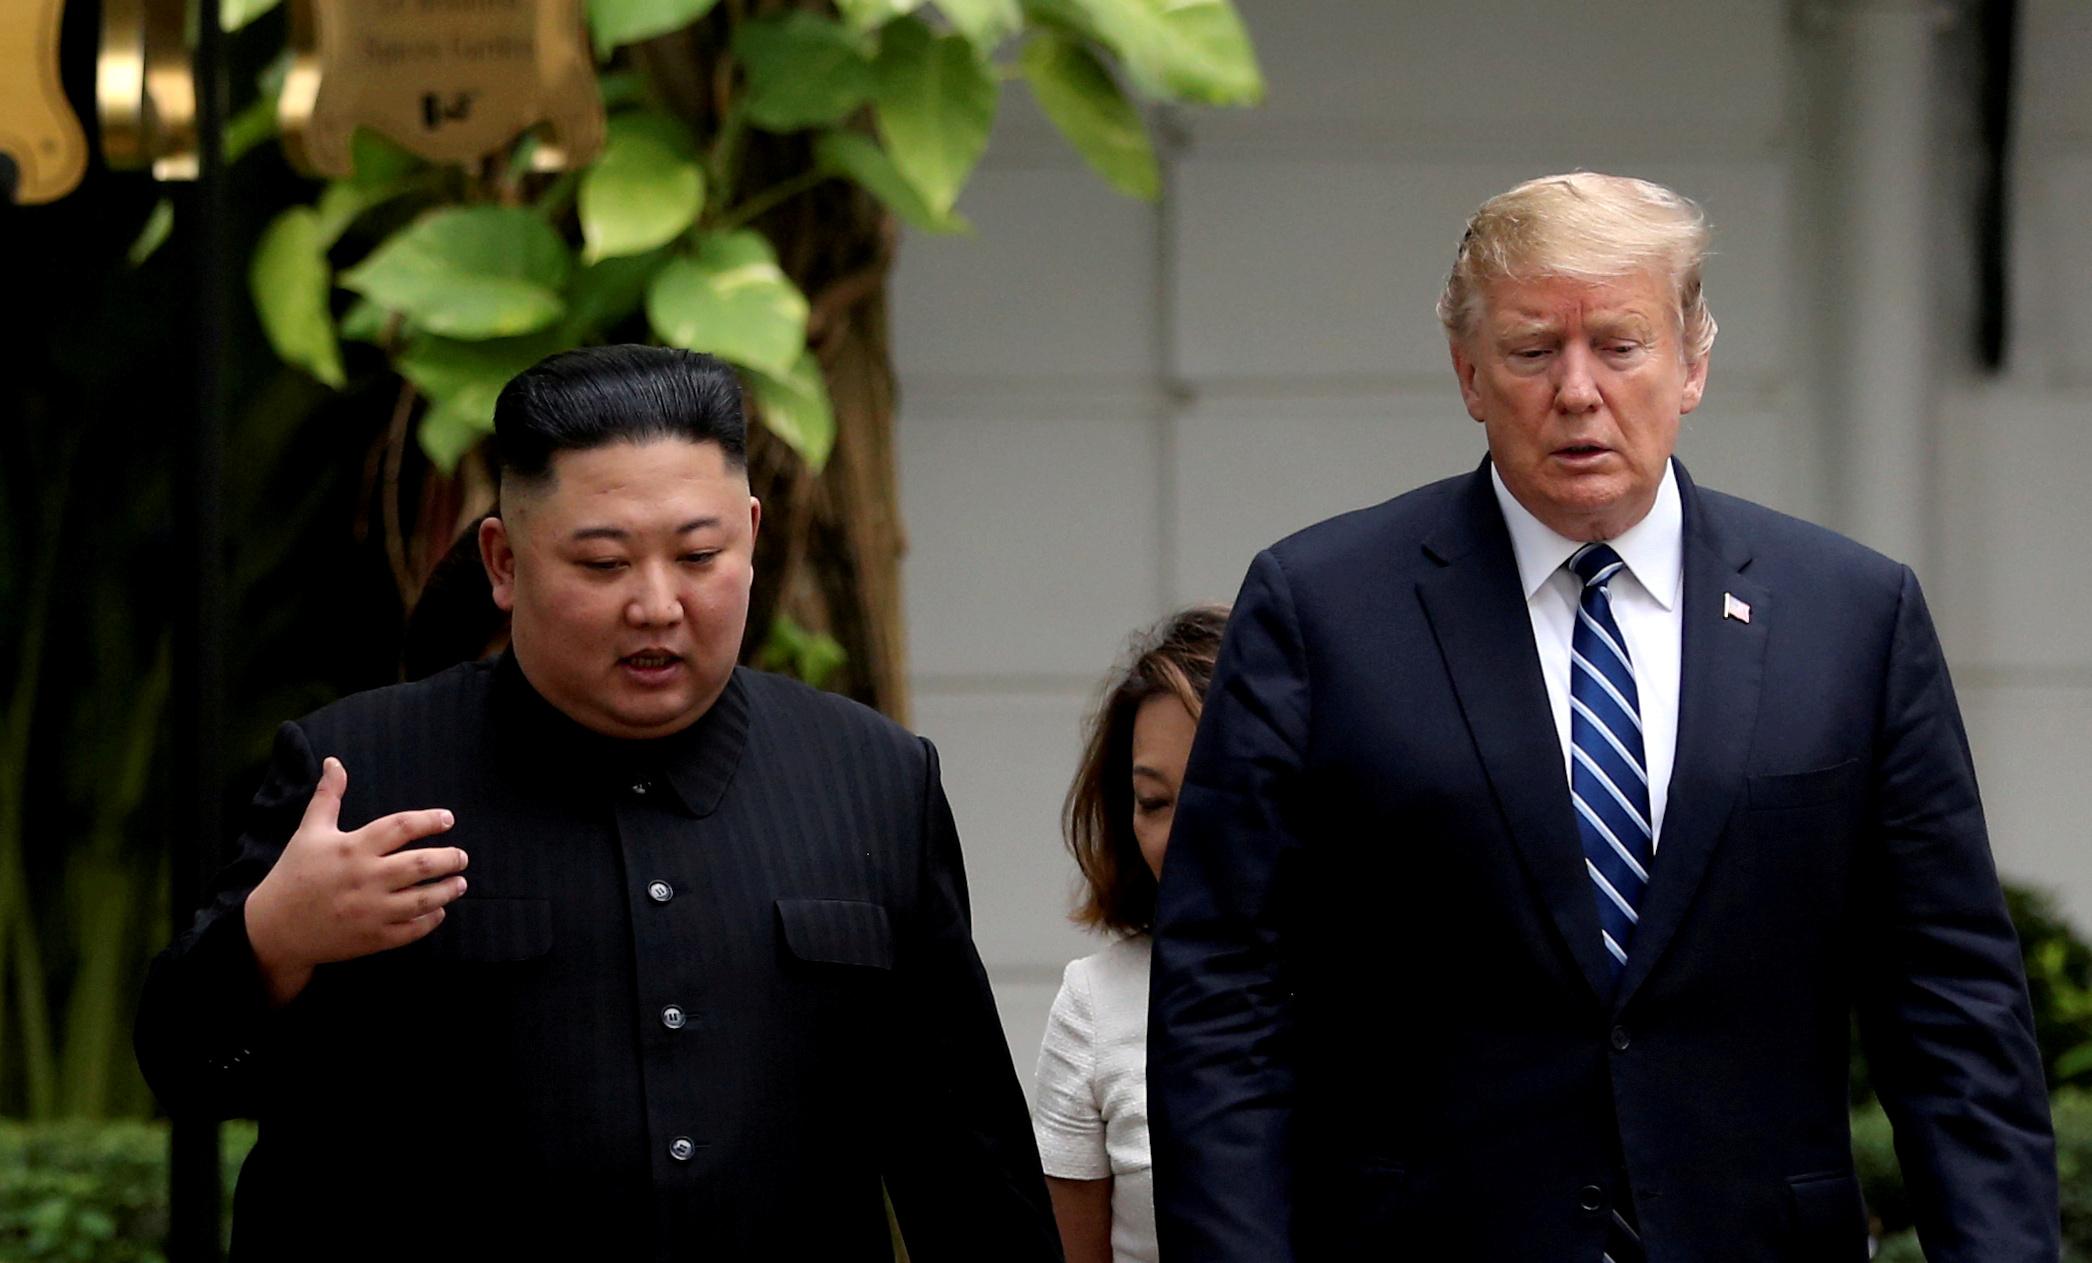 FILE PHOTO: North Korea's leader Kim Jong Un and U.S. President Donald Trump talk in the garden of the Metropole hotel during the second North Korea-U.S. summit in Hanoi, Vietnam February 28, 2019. REUTERS/Leah Millis